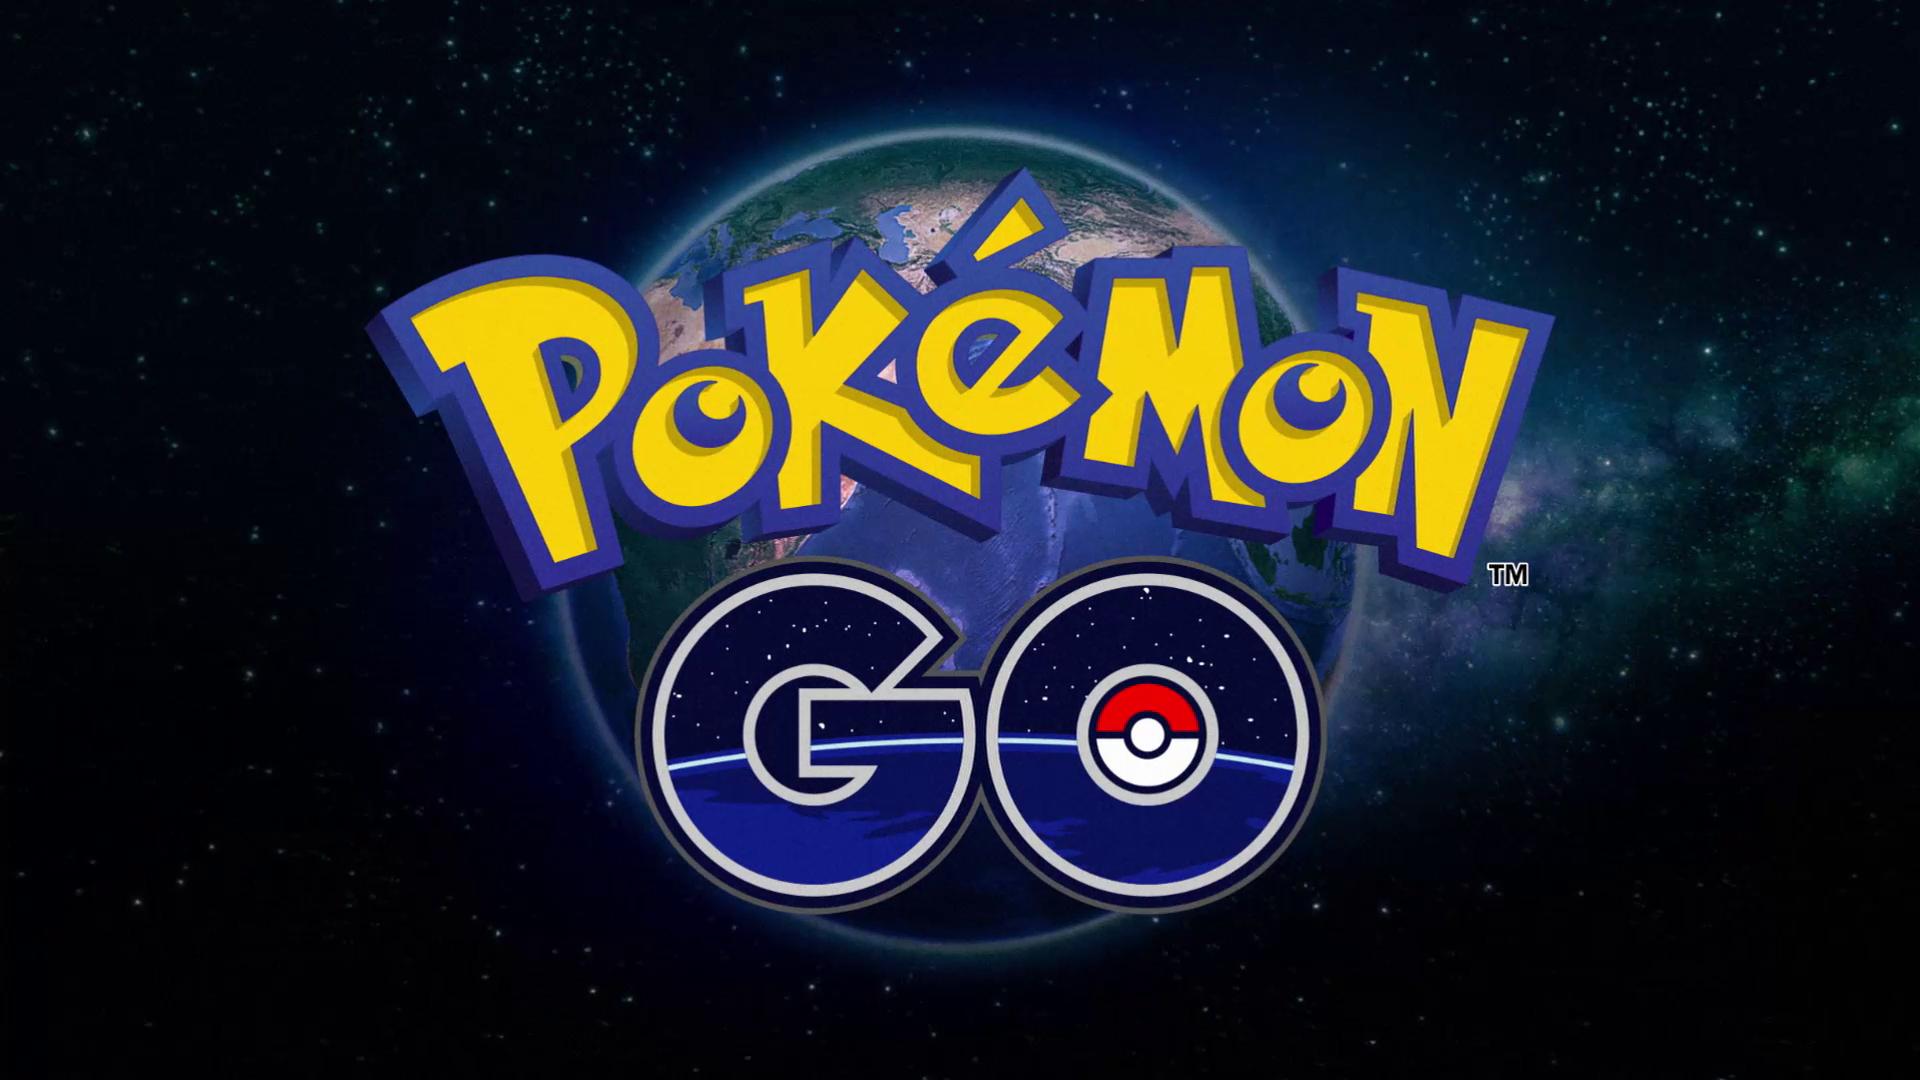 Pokémon GO Title